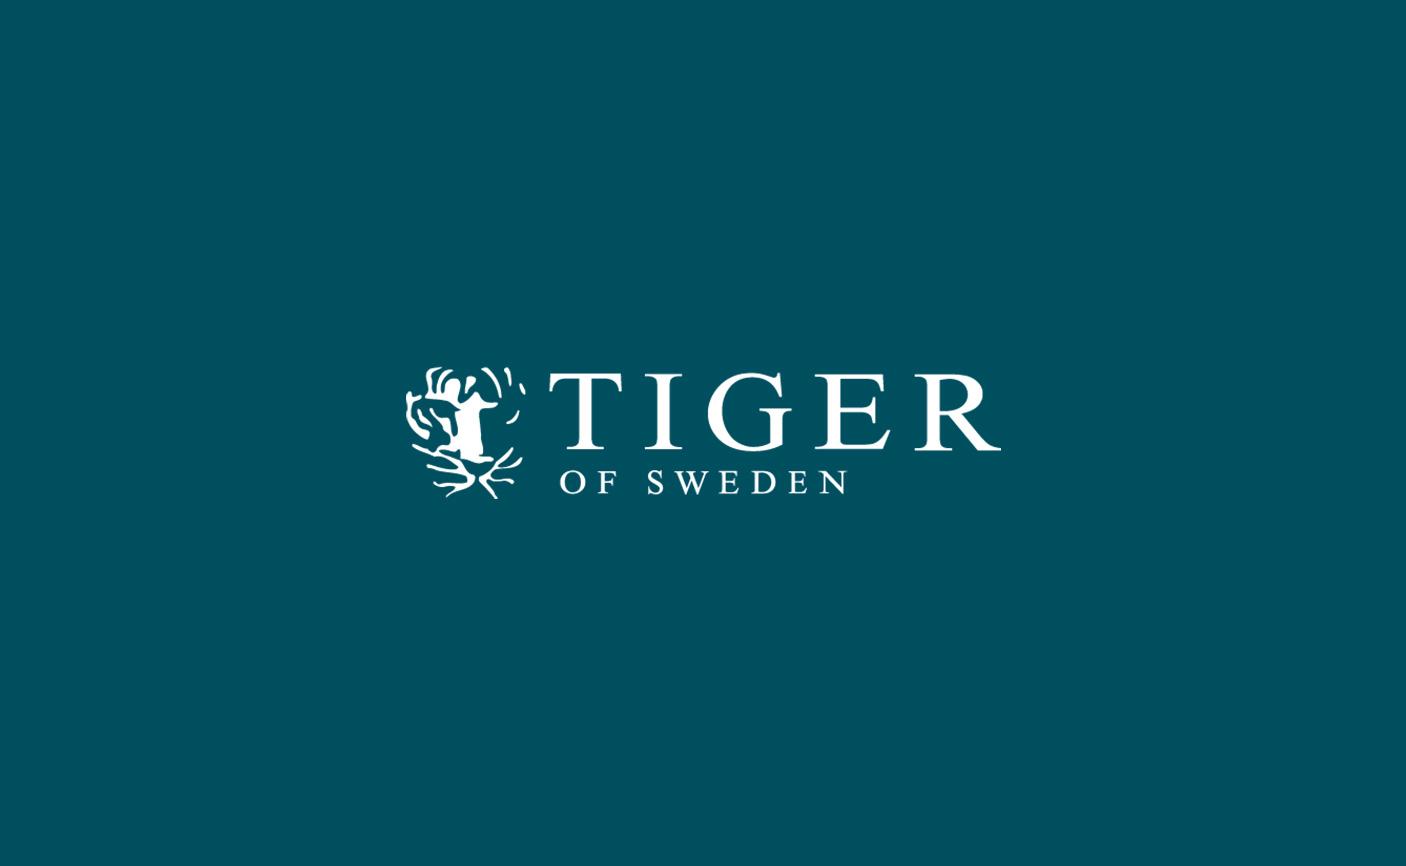 customer-quotes_skagerrak-tiger-of-sweden